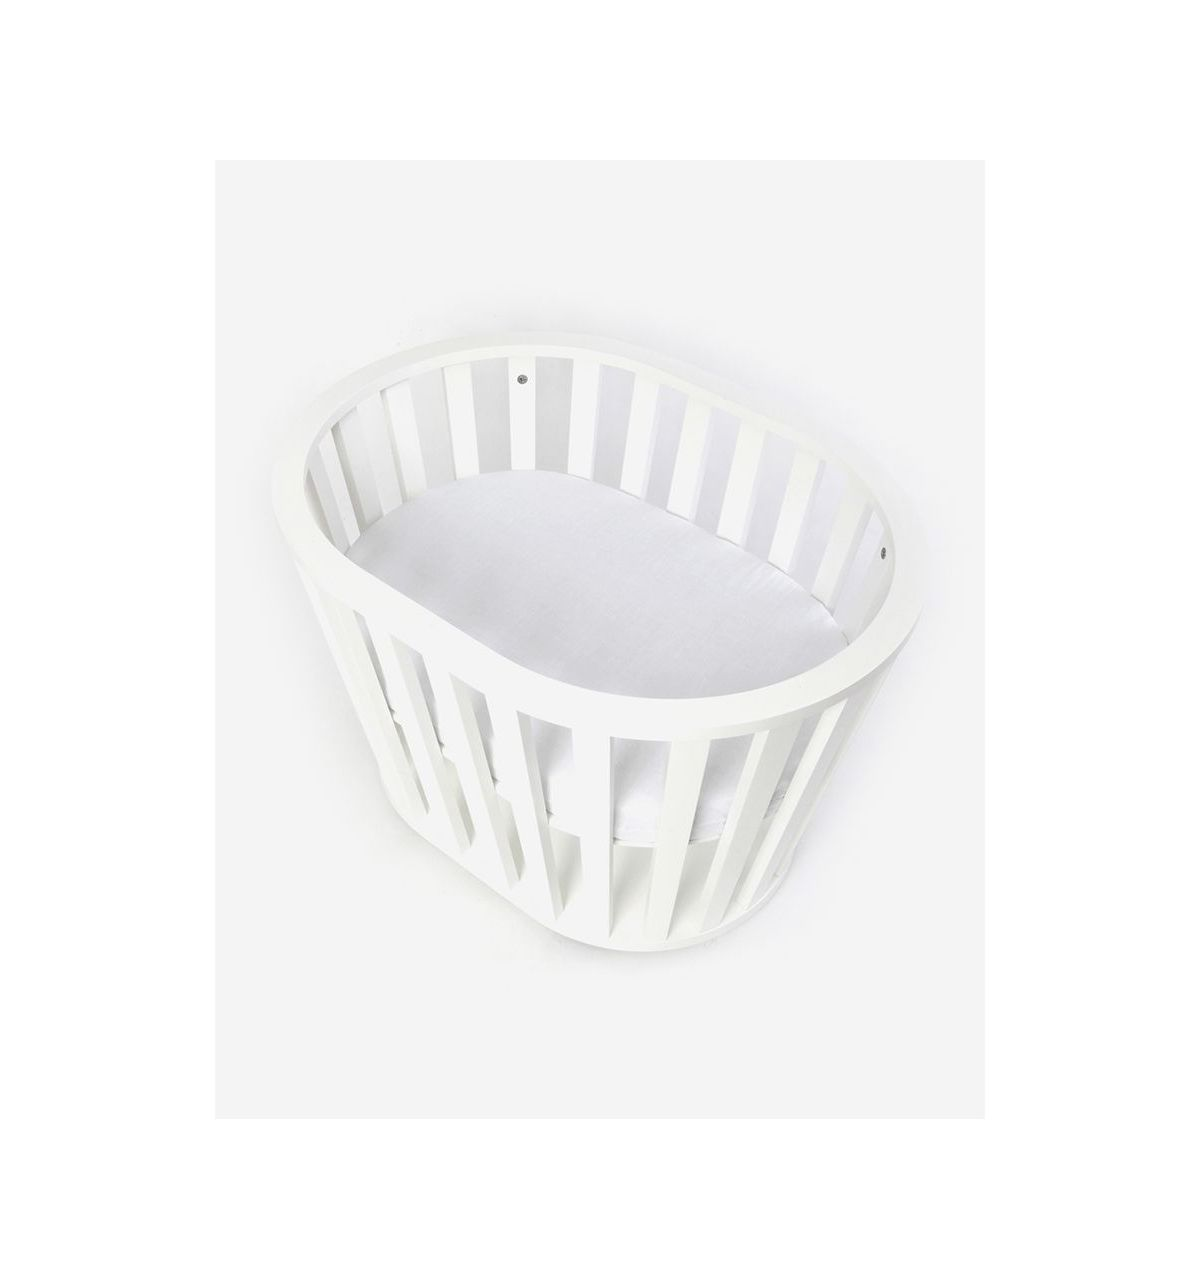 guum barcellona culla evolutiva miniguum bianco. Black Bedroom Furniture Sets. Home Design Ideas